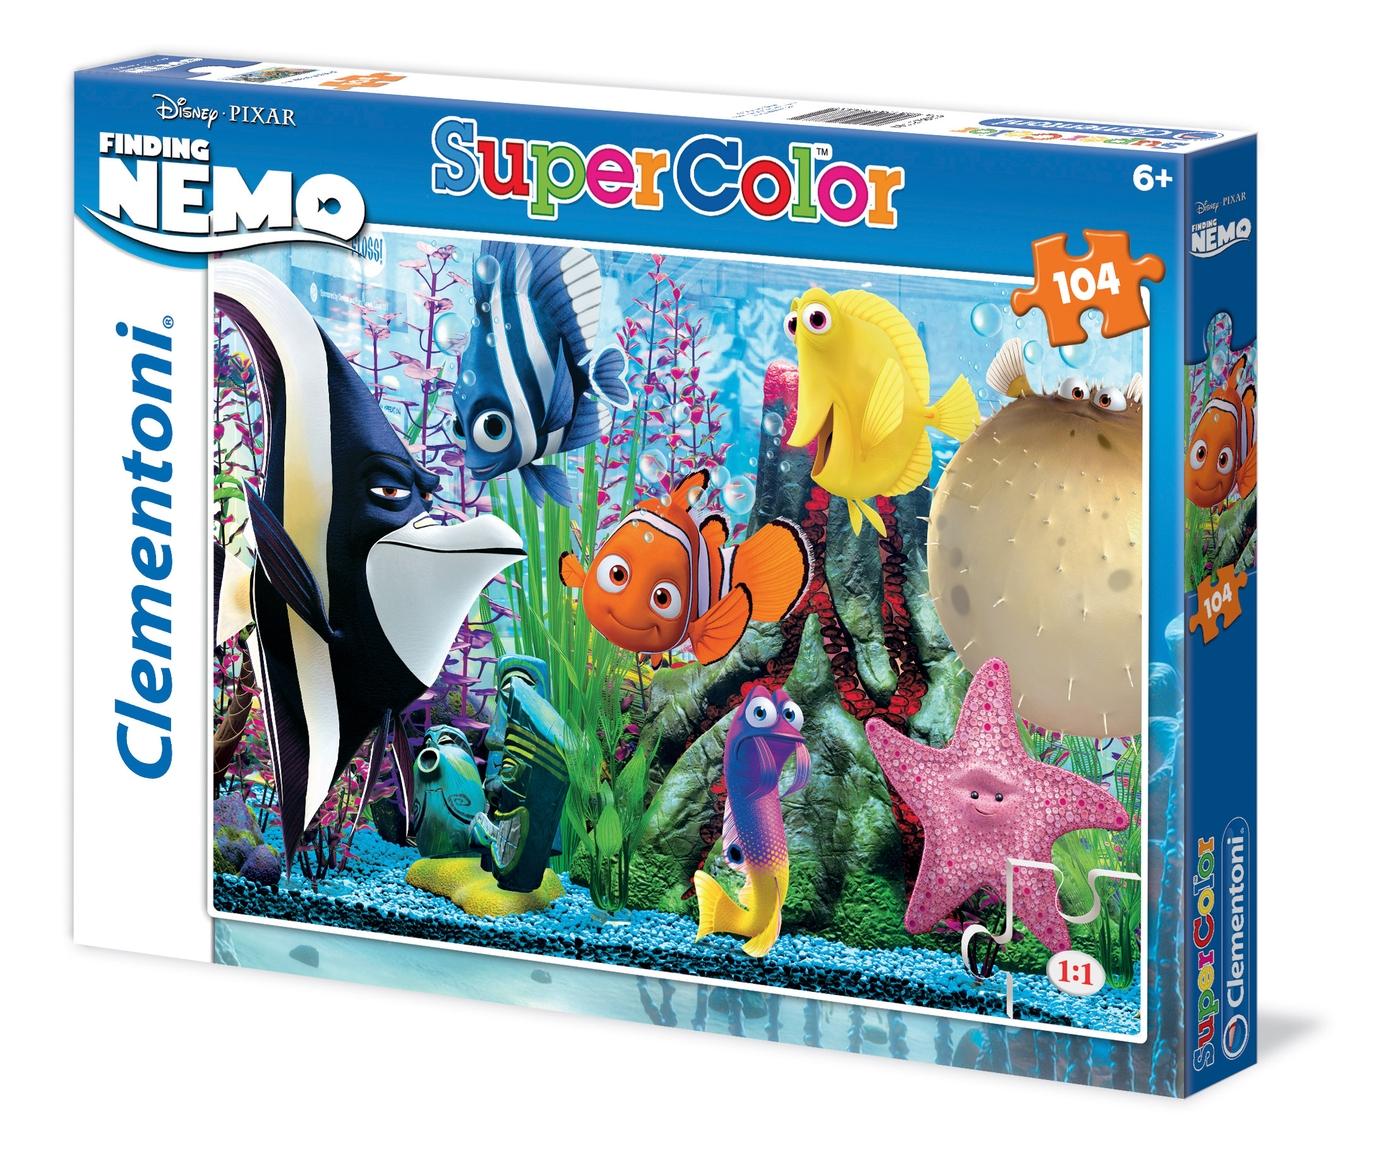 Пазлы Clementoni/Nemo арт.: 27883 (104 эл.)